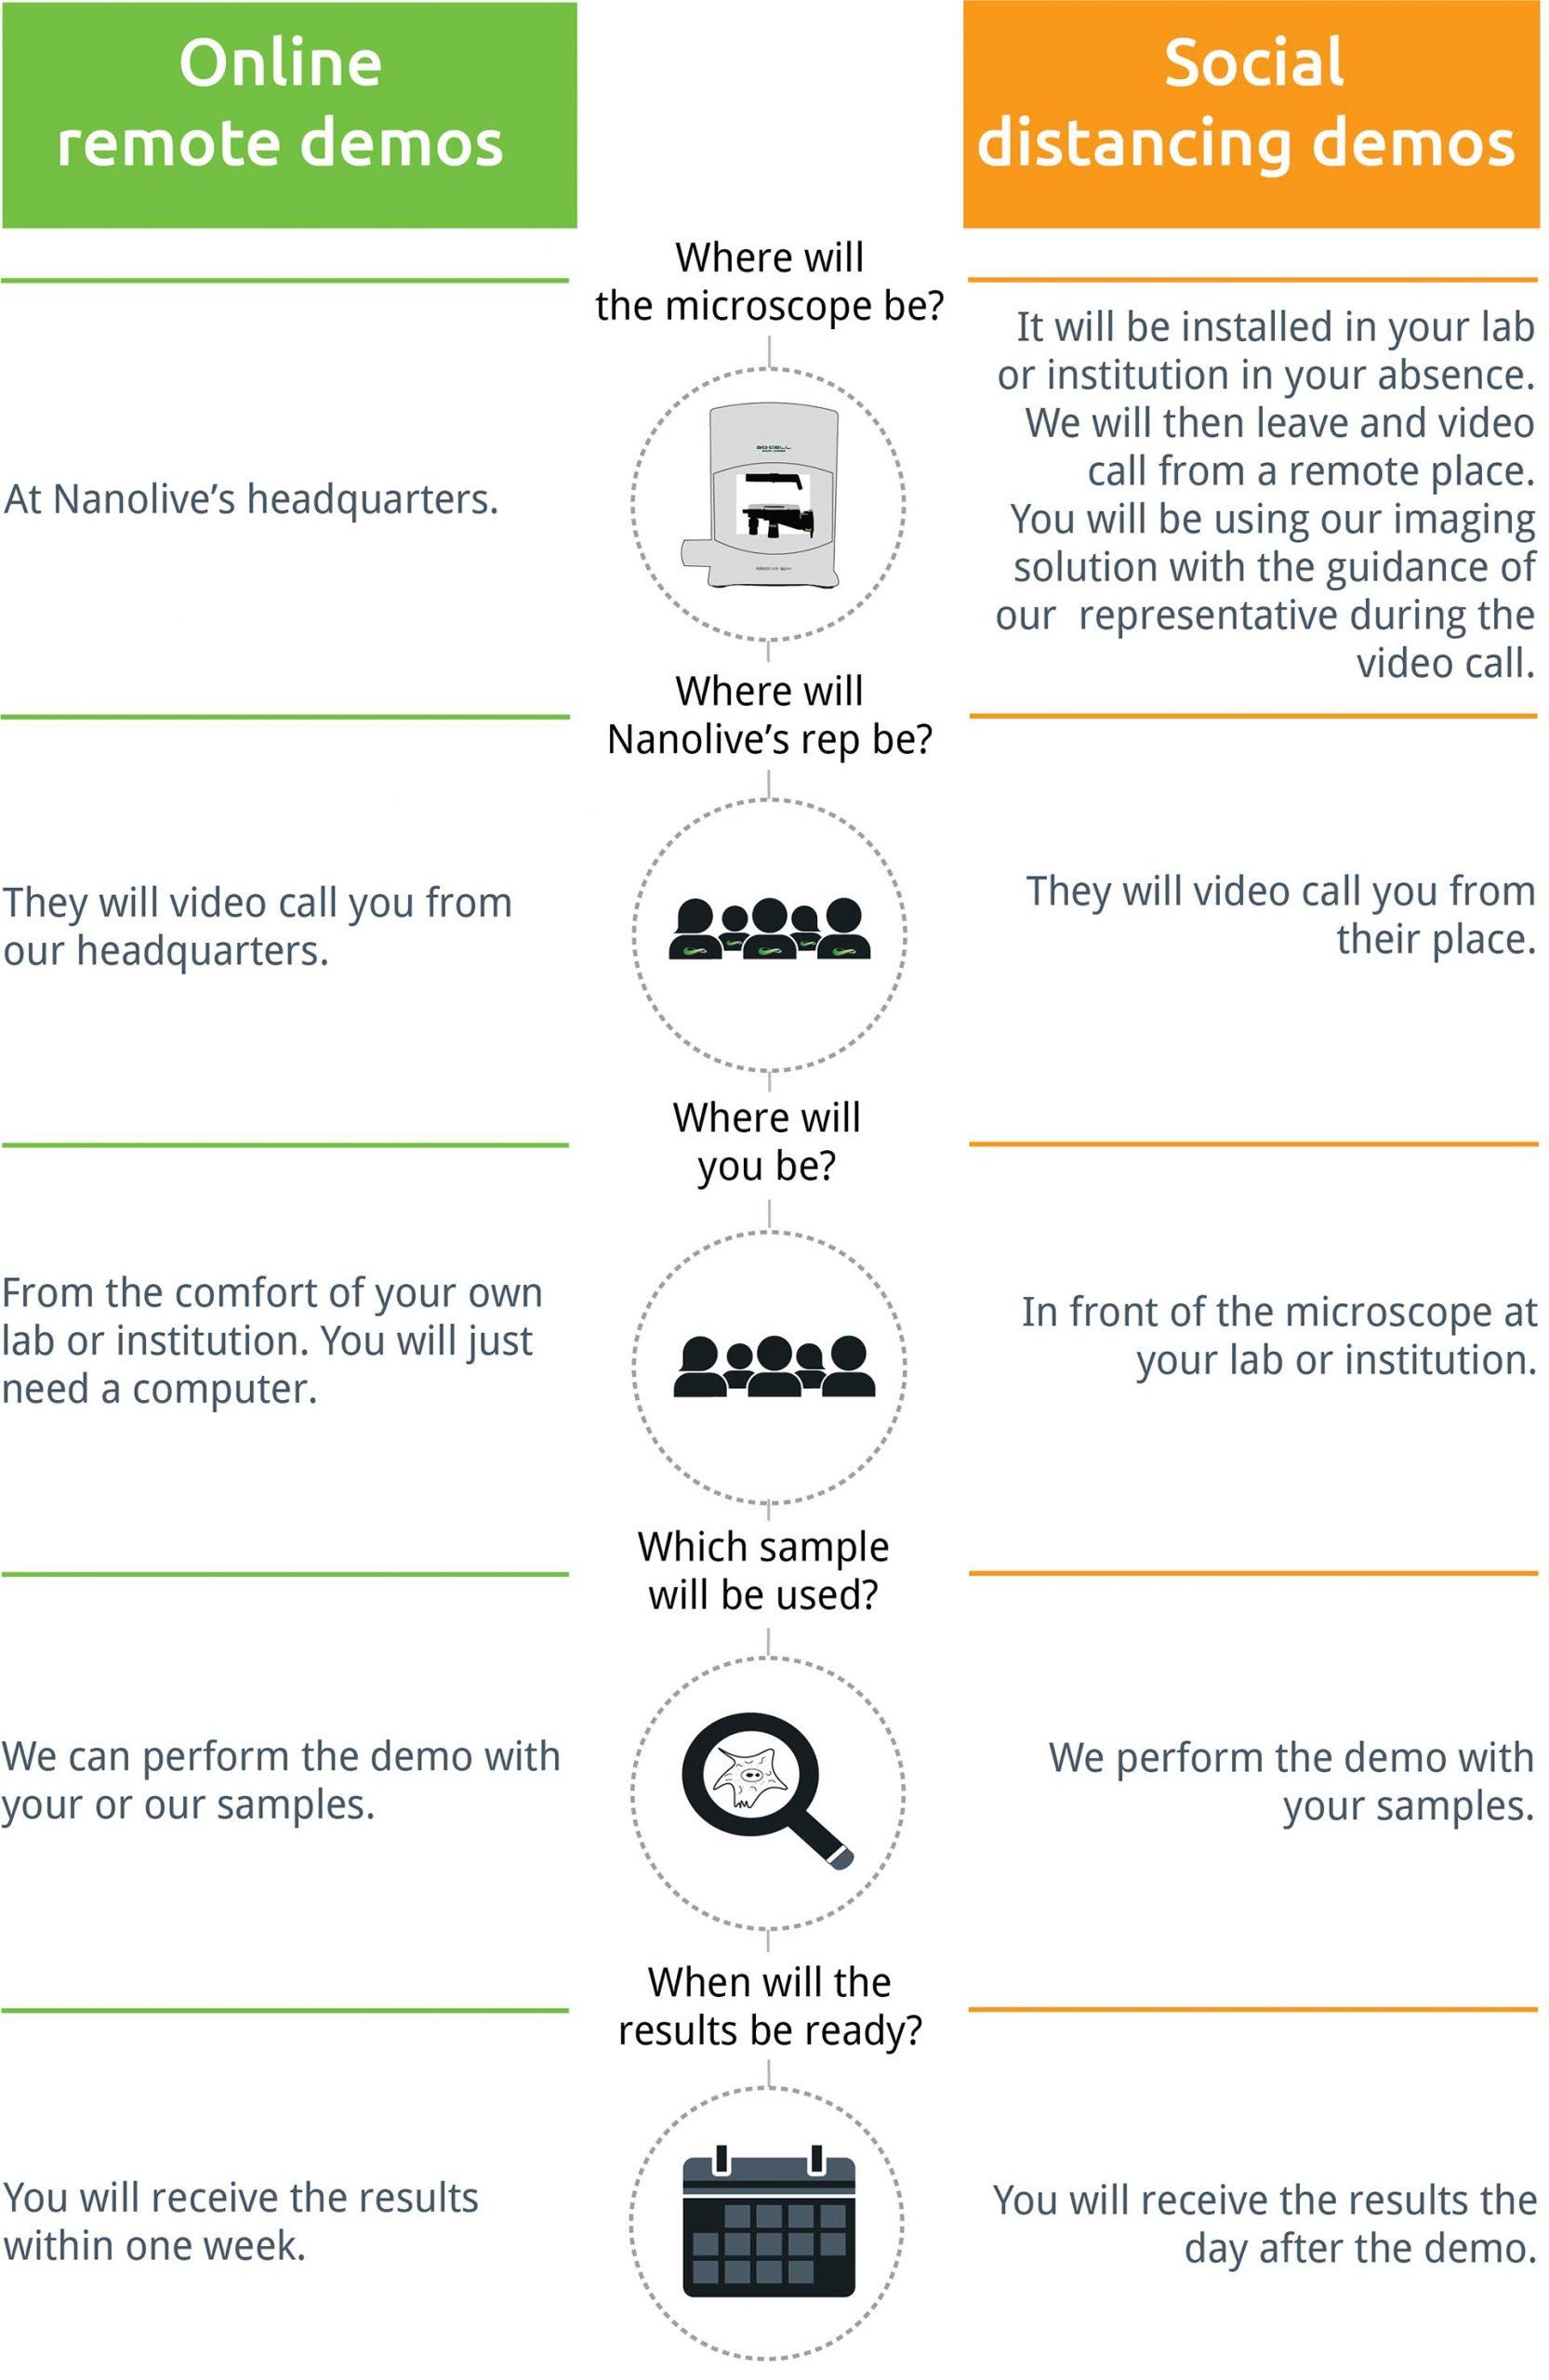 Online Demos Social Distancing Demos Infographics